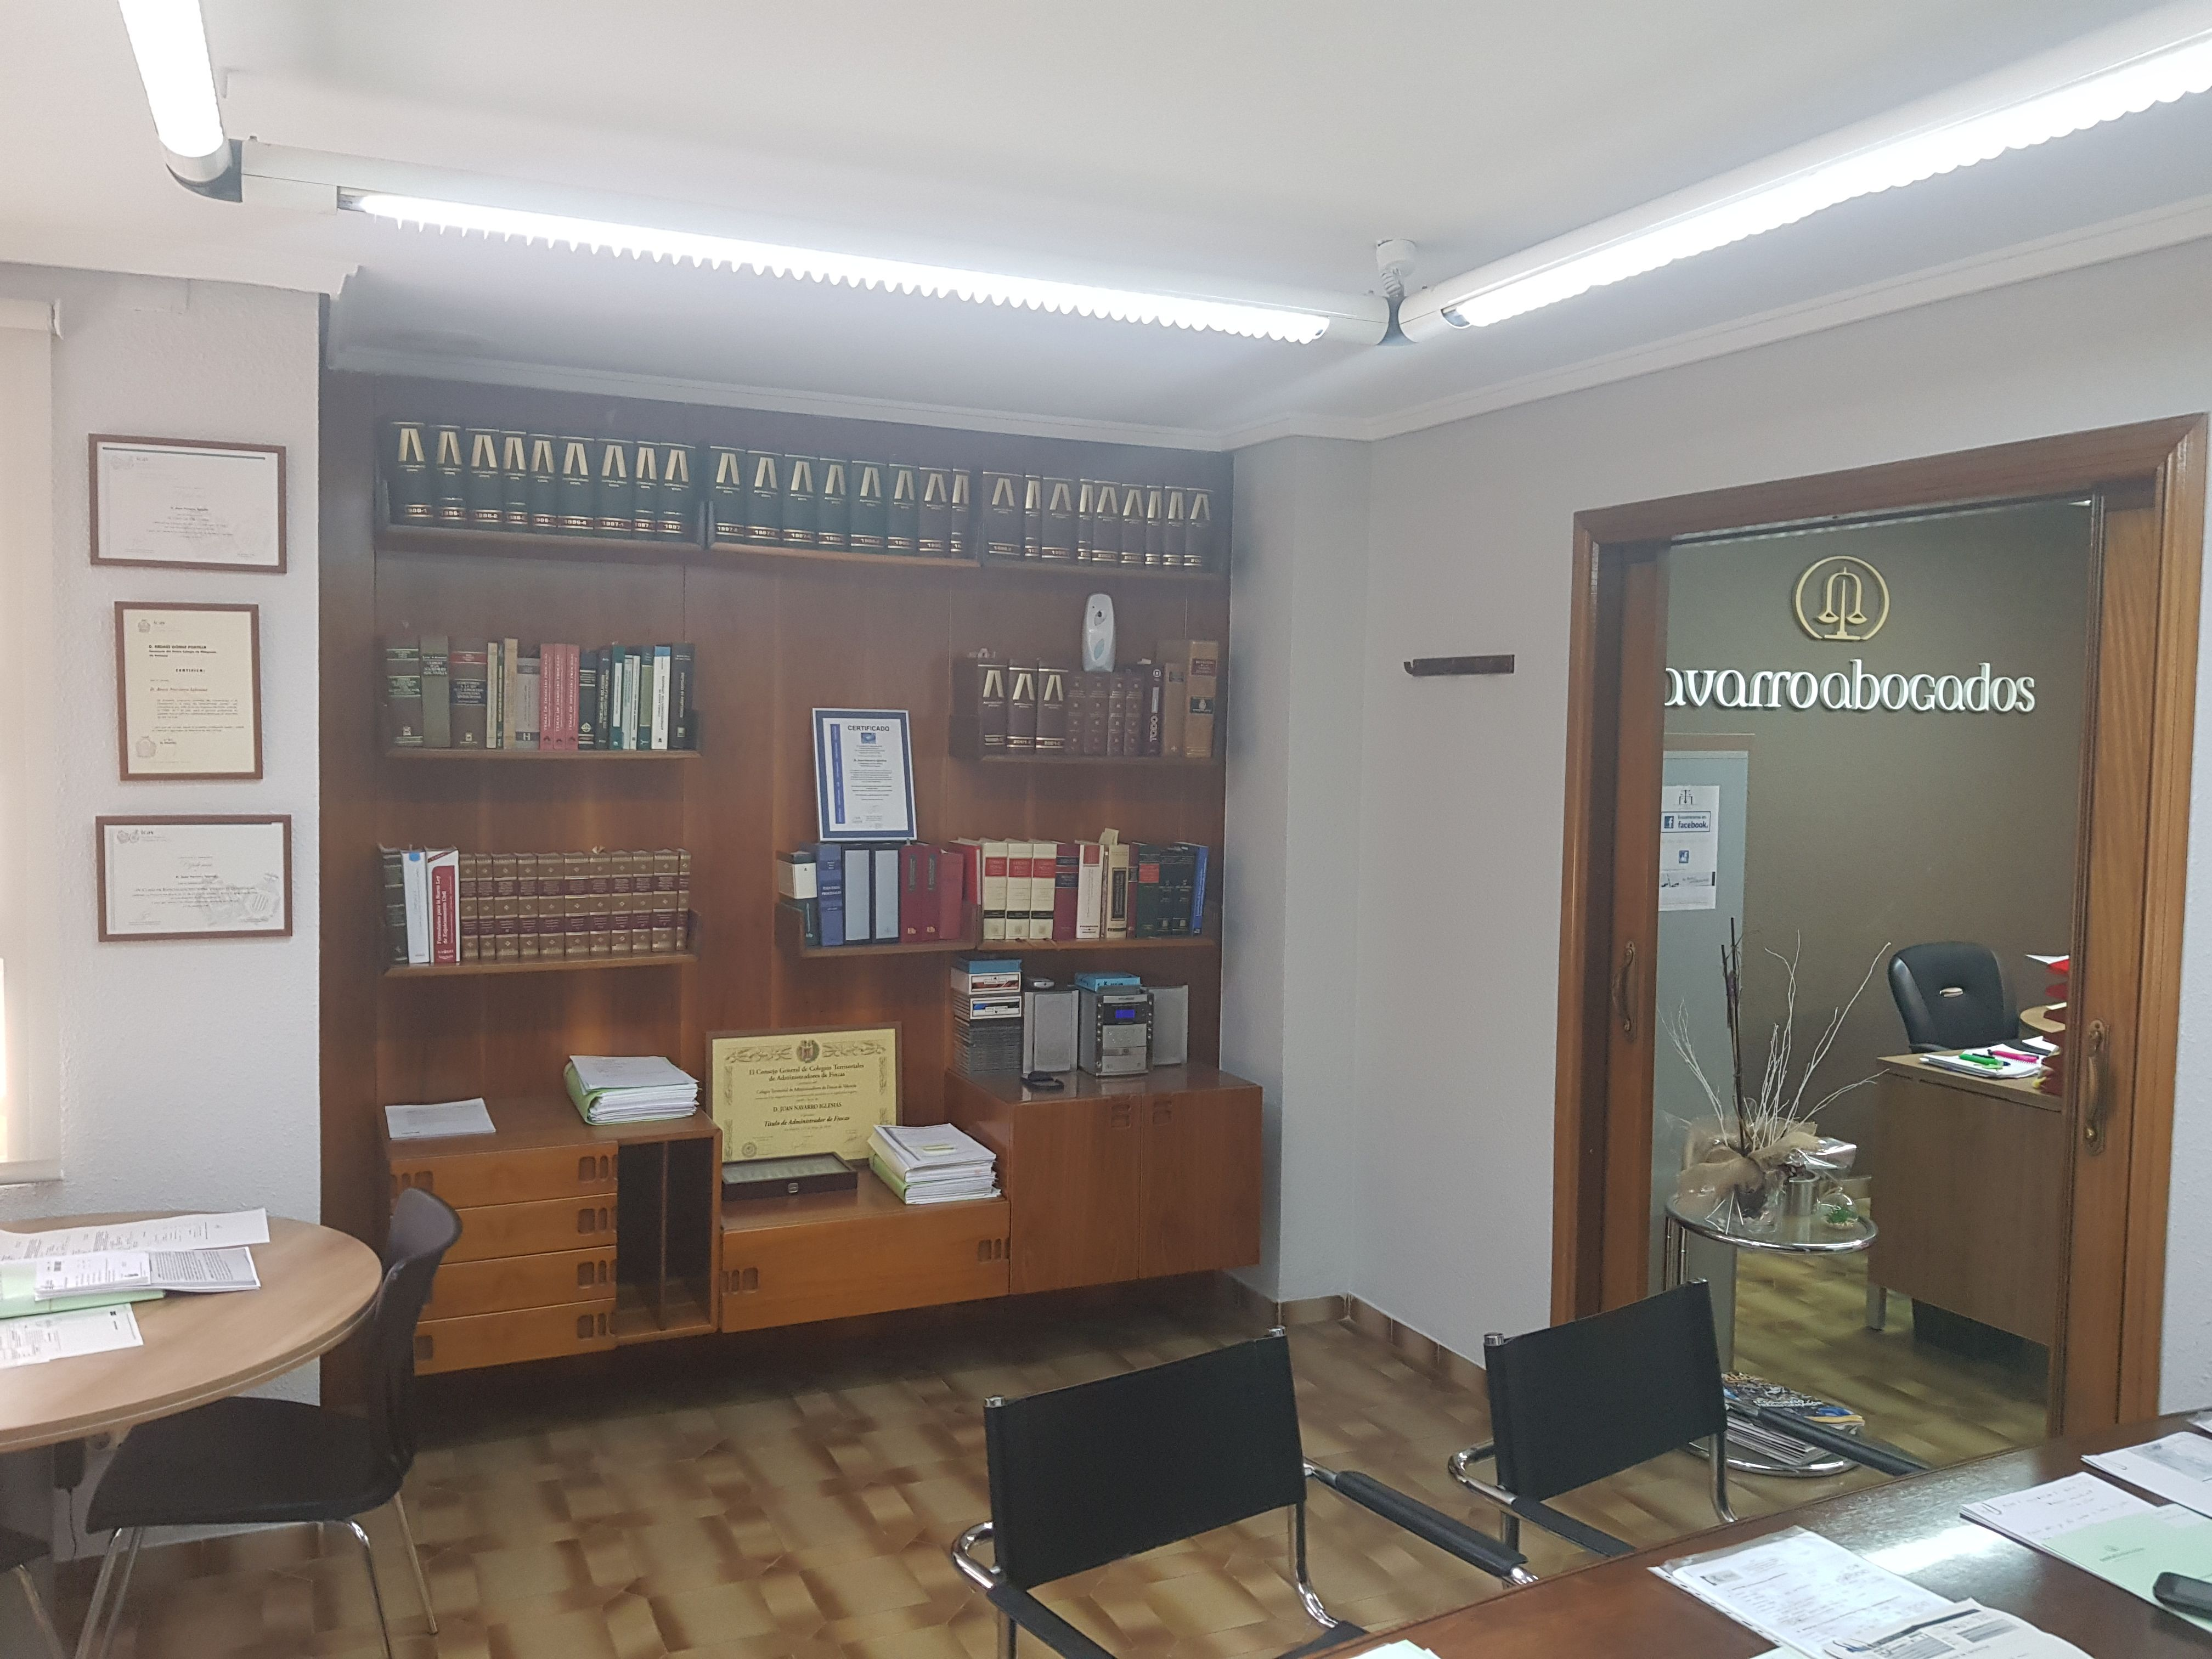 Despacho de abogados Puerto de Sagunto